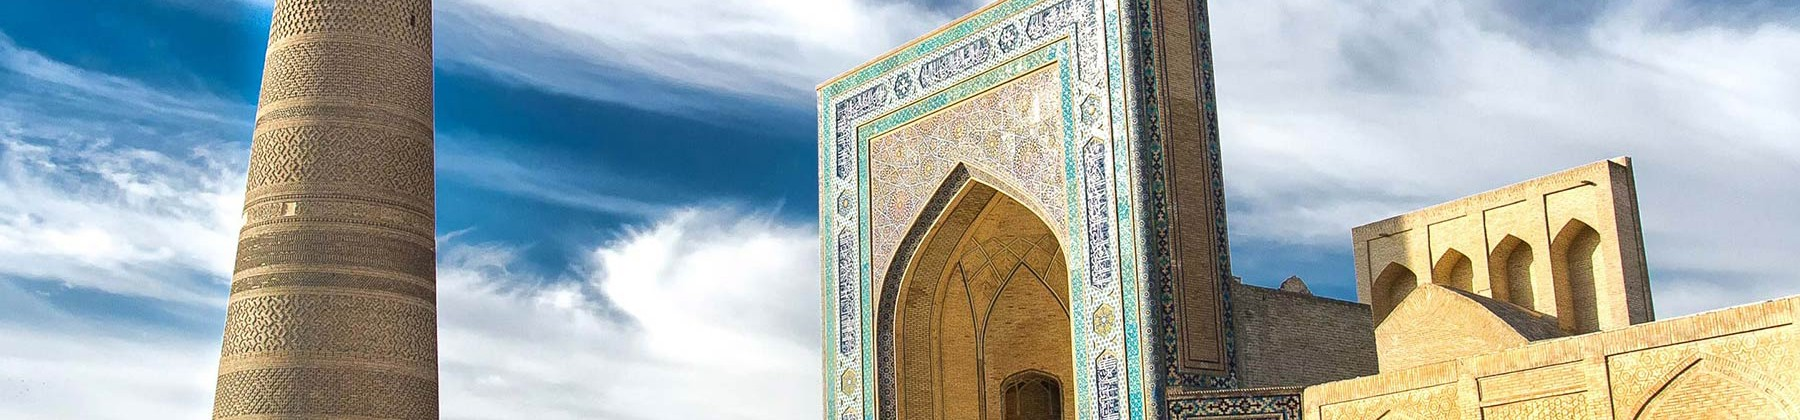 Uzbekistan Tour - Full Package - 1